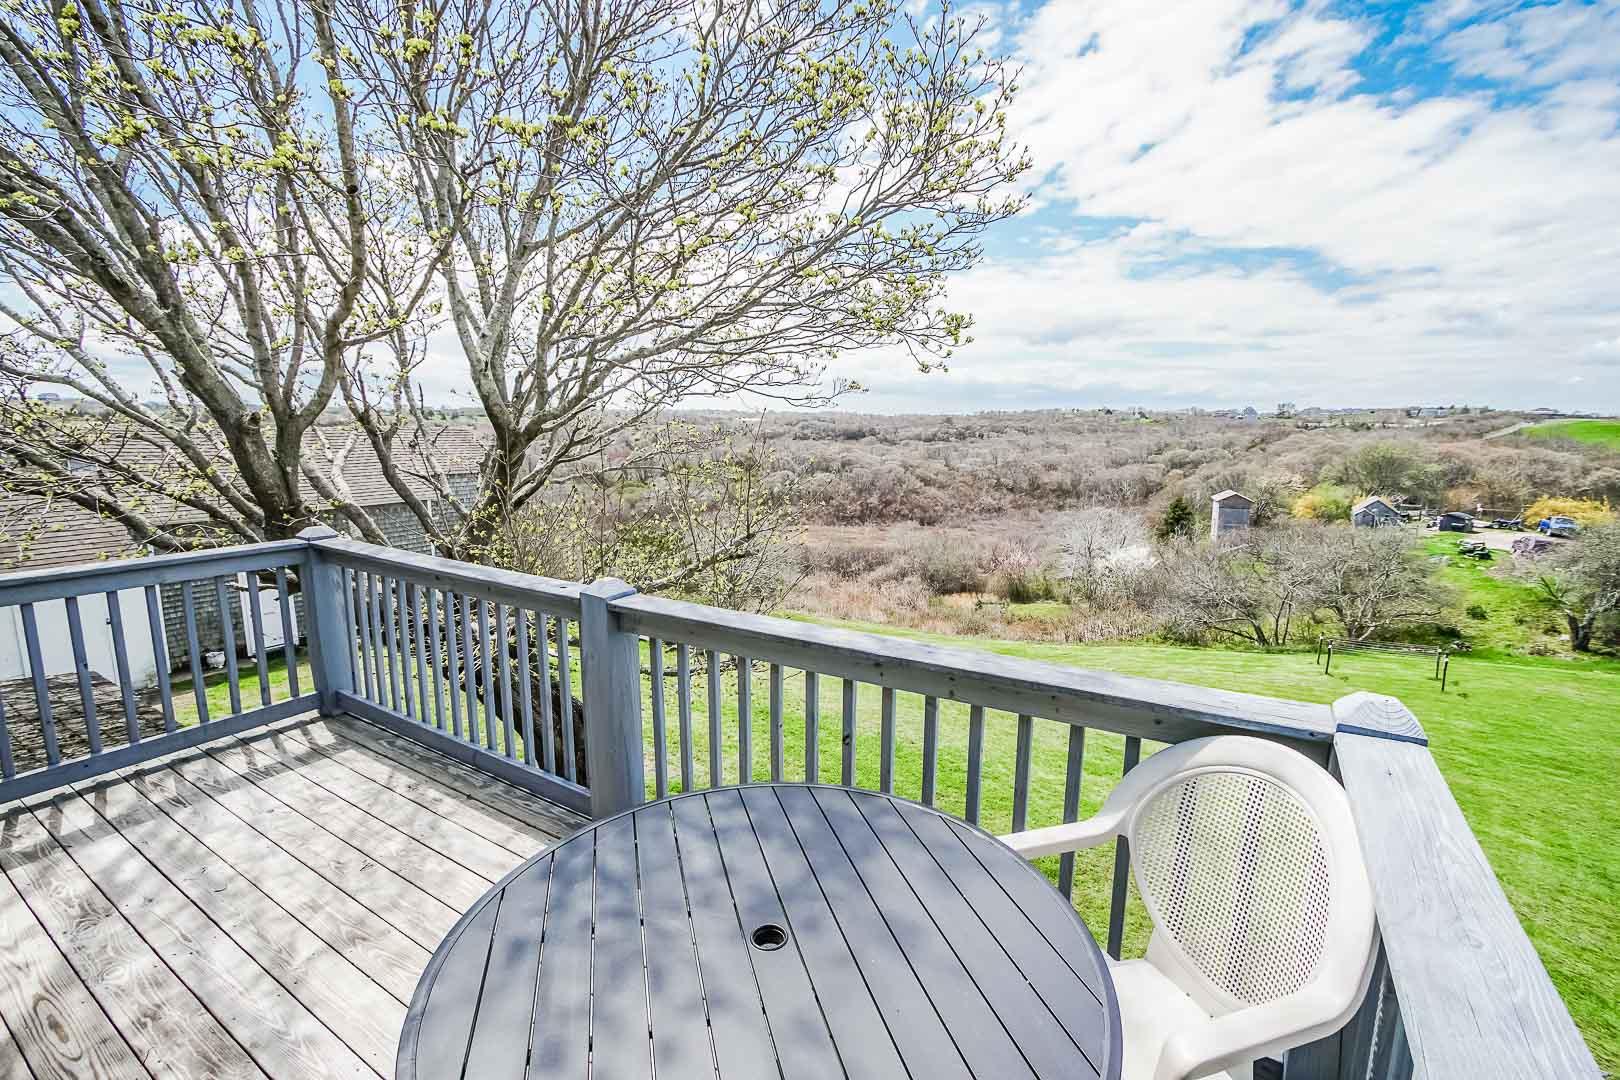 A scenic patio deck at VRI's Neptune House Resort in Rhode Island.